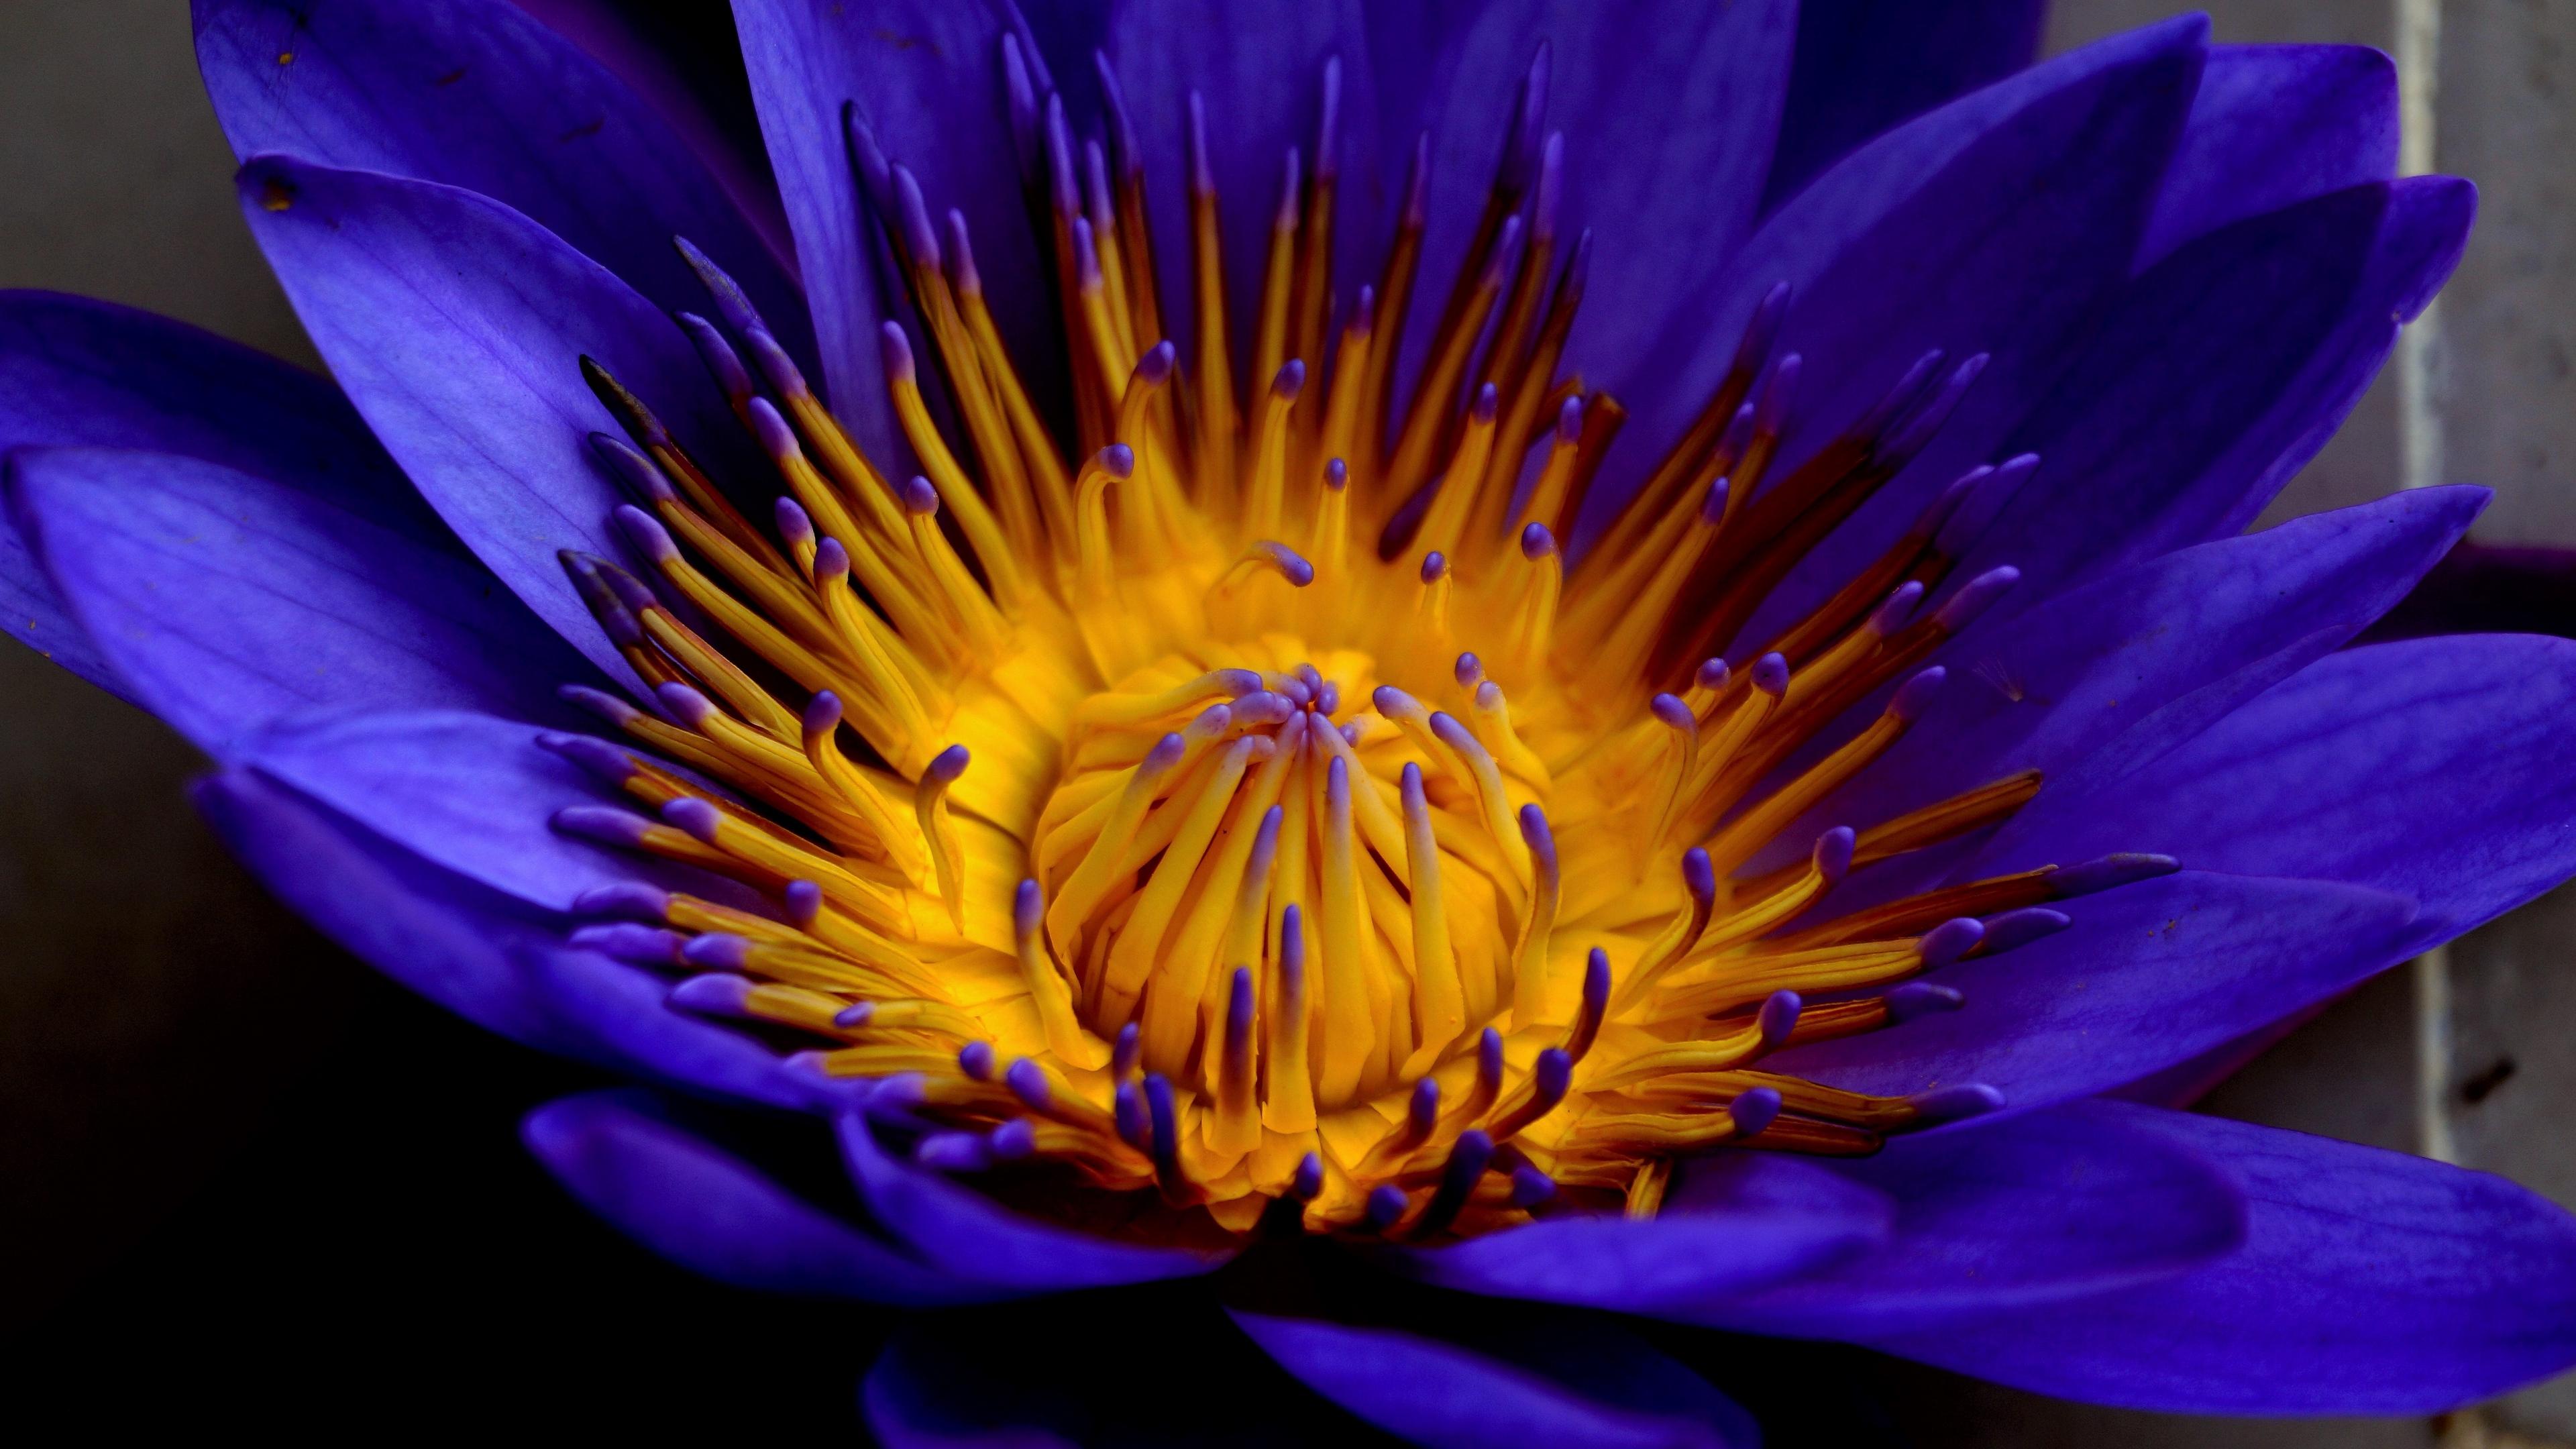 blue lotus star lotus water lily star petals bud 4k 1540064355 - blue lotus, star lotus, water lily star, petals, bud 4k - water lily star, star lotus, blue lotus